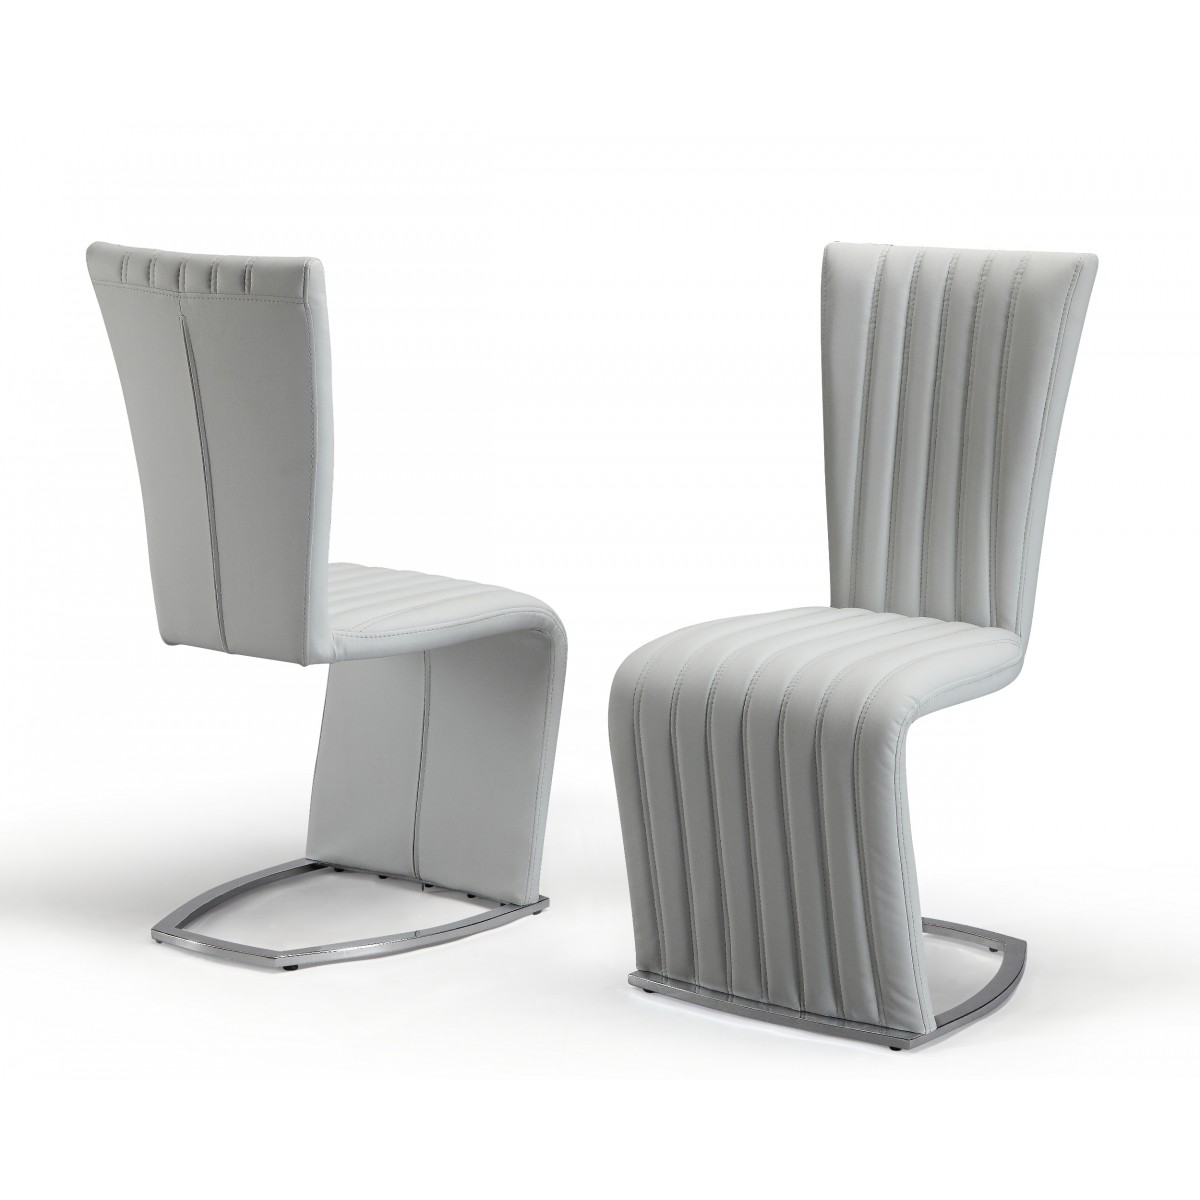 Barcelona Dining Chairs, Creative Furniture, Creative, Dining Sets, Modern  Dining Sets, Dining Room Furniture, Contemporary Dining Room, Dining Room  Chairs, ...